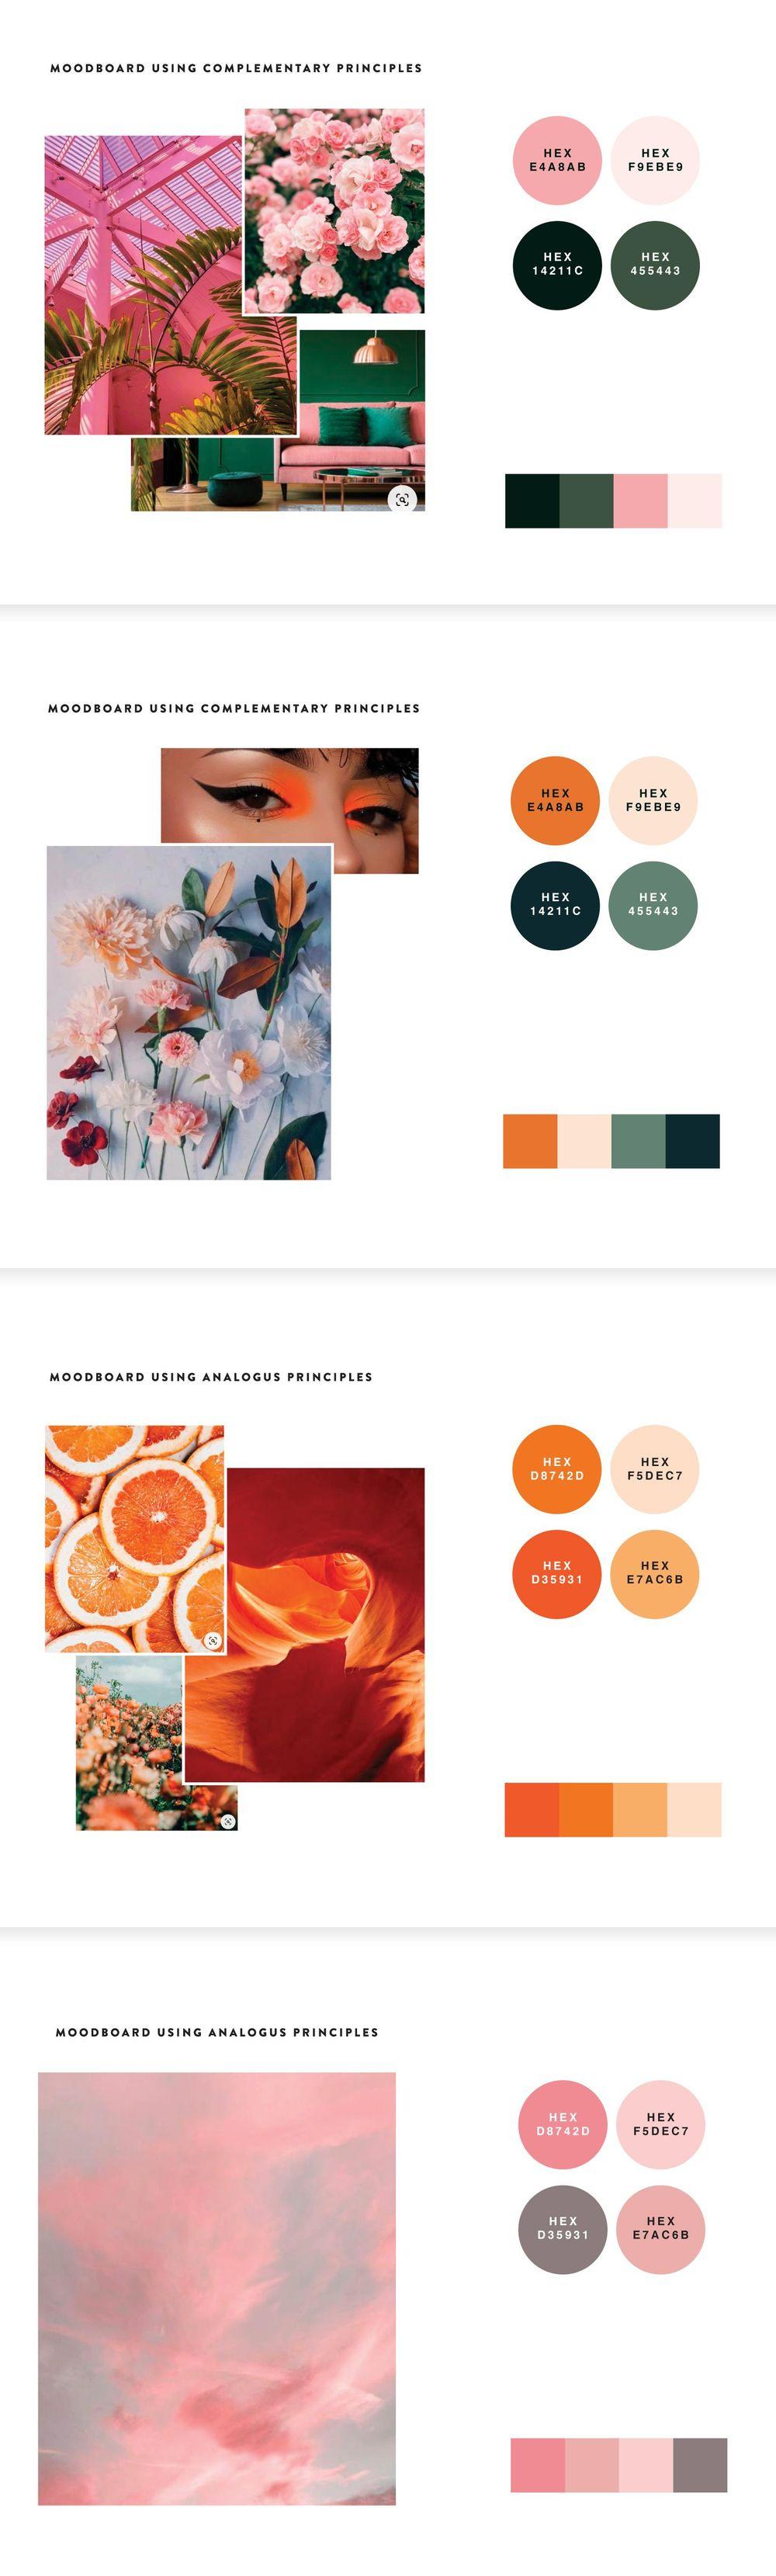 Color studies - image 3 - student project